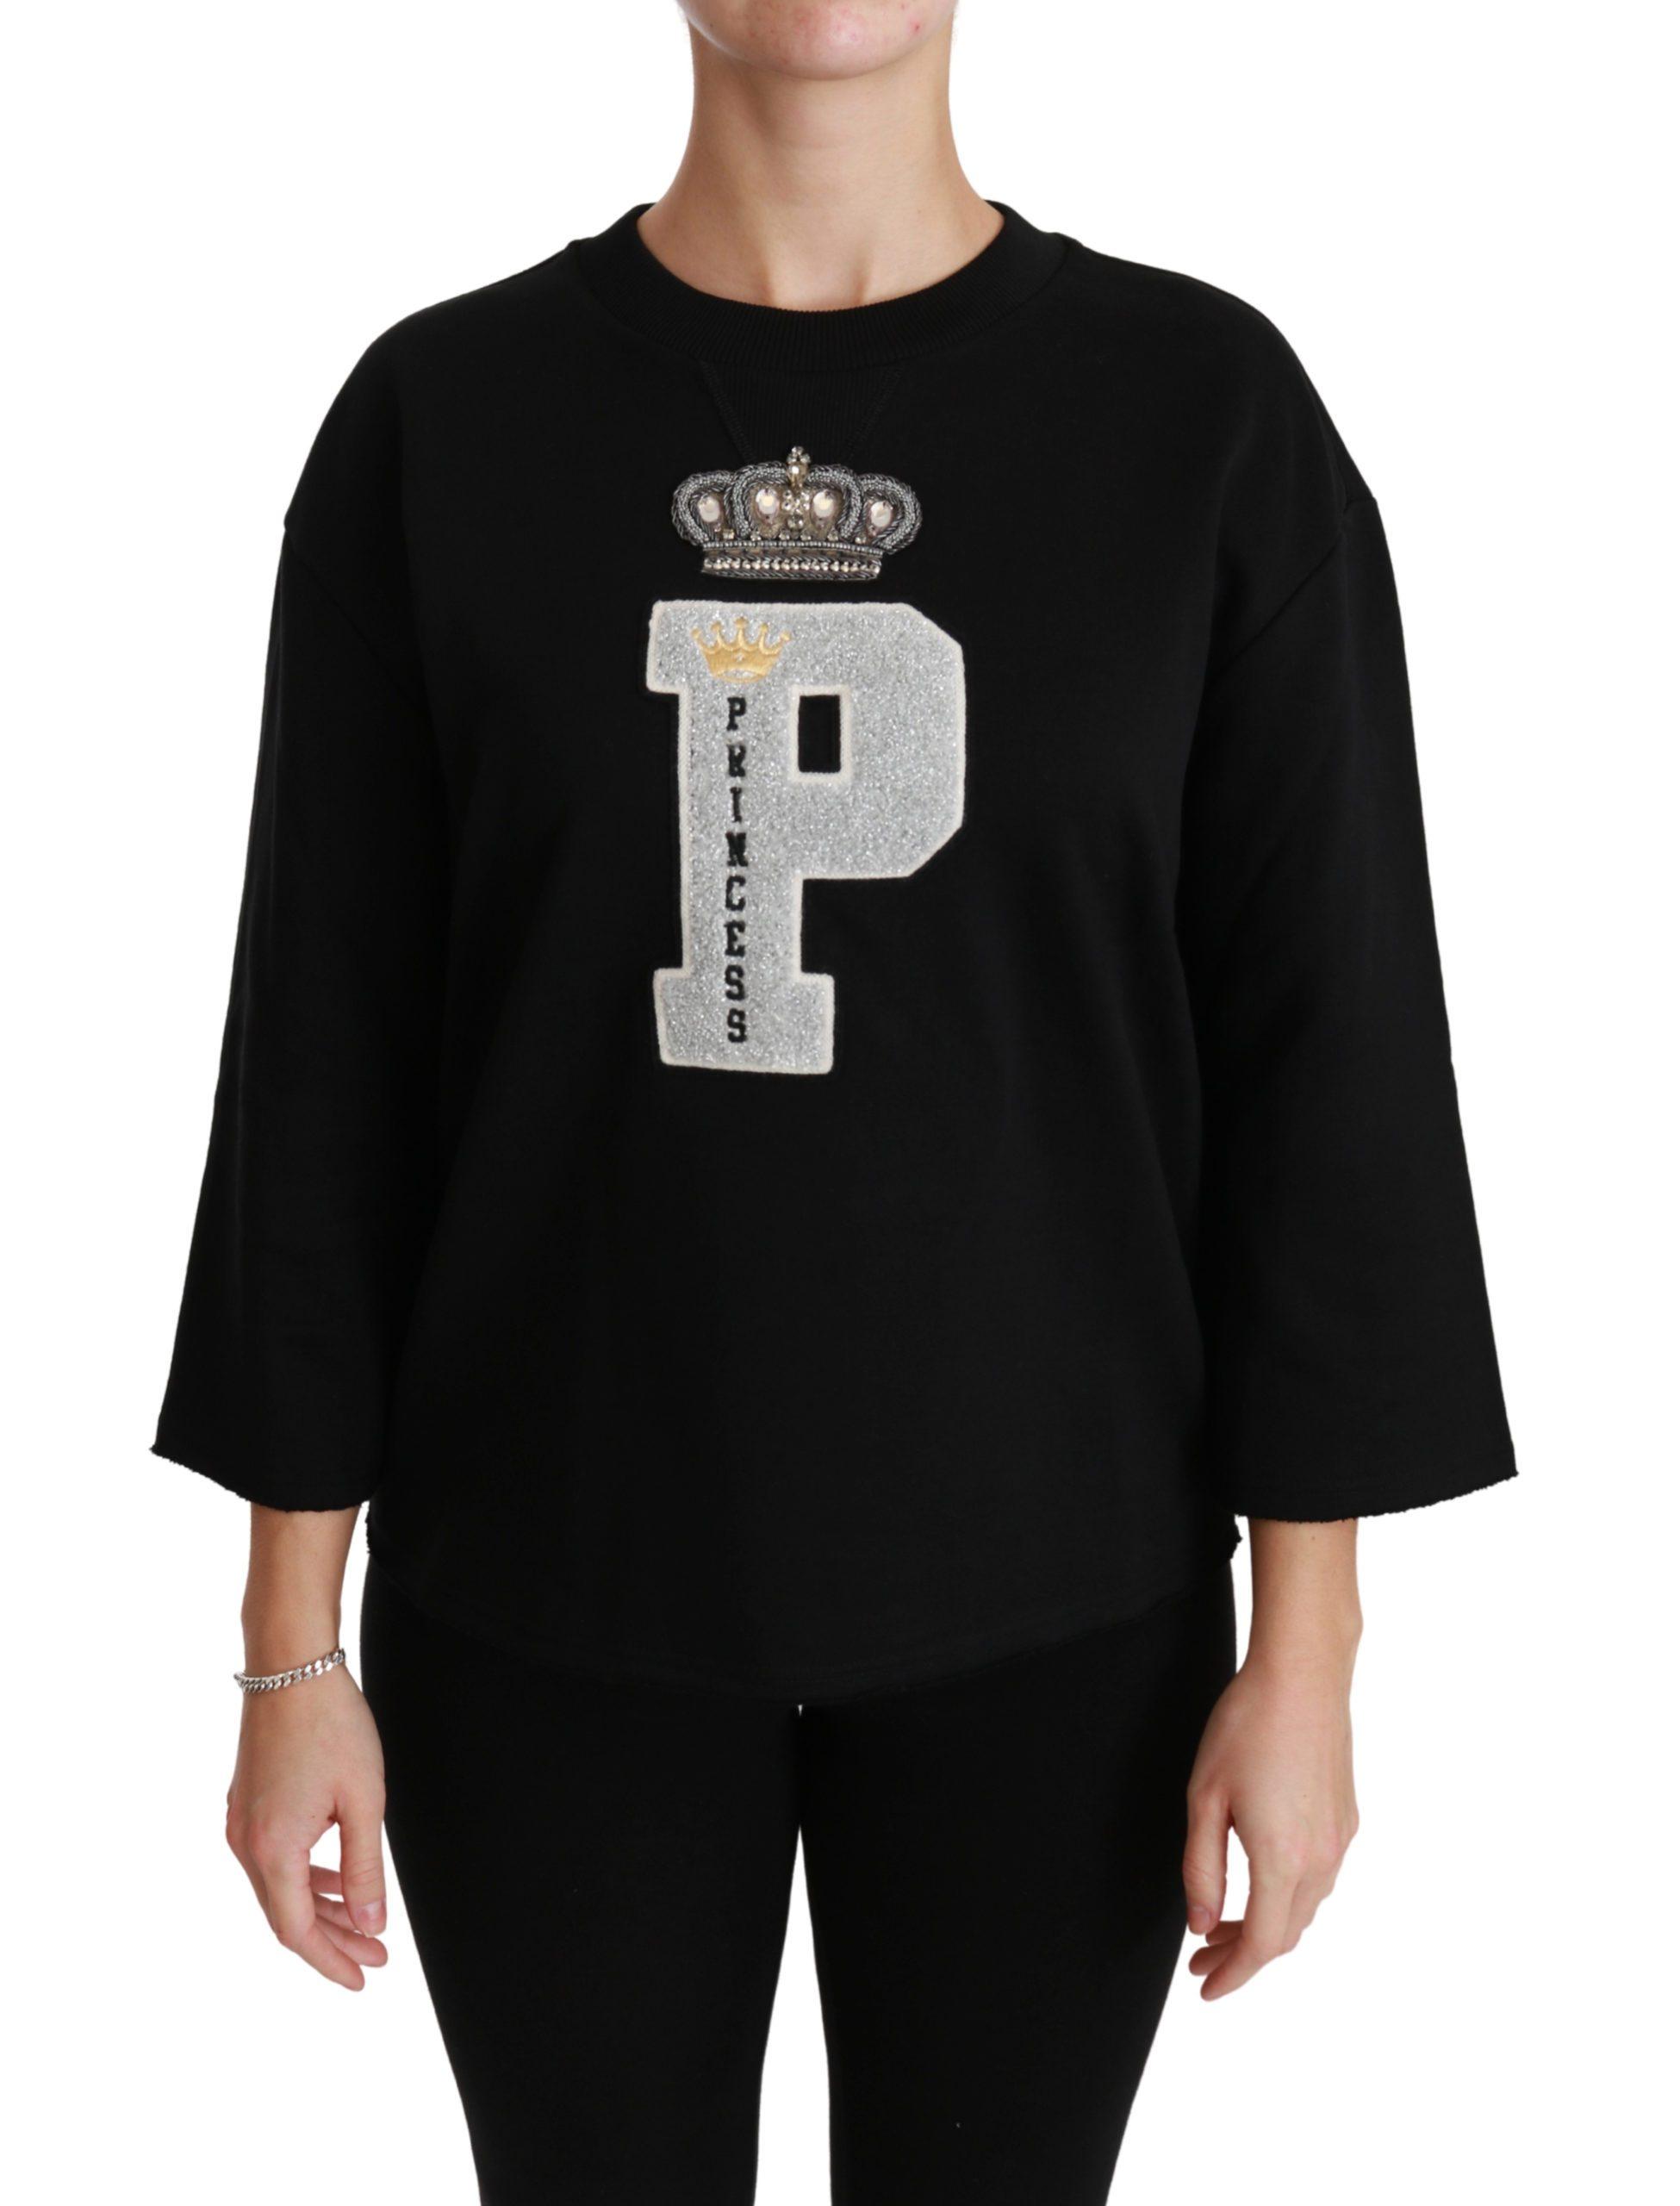 Black Princess Crystal Crown Top Sweater - IT46|XL